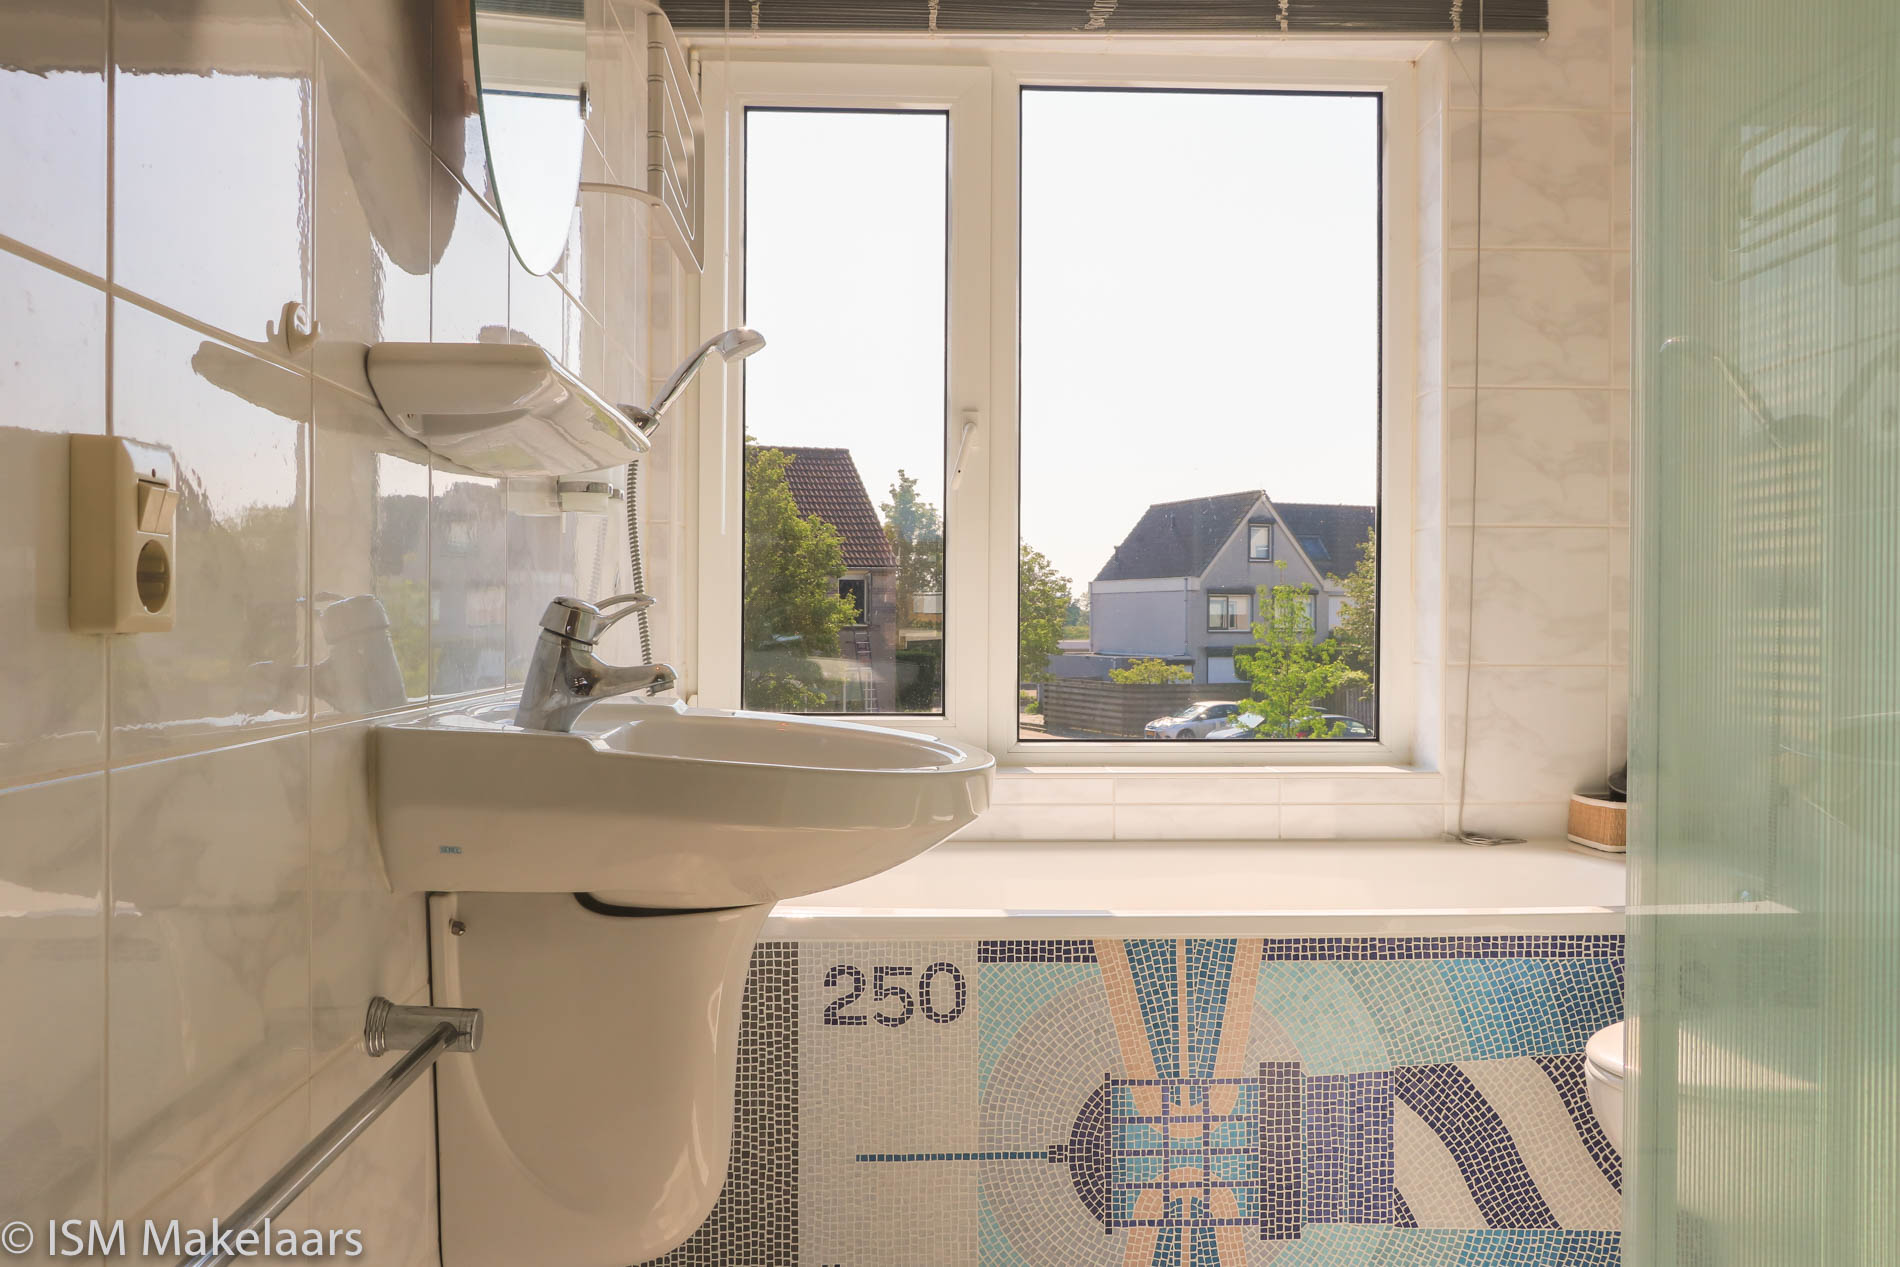 badkamer meekrap 25 krabbendijke ISM Makelaars